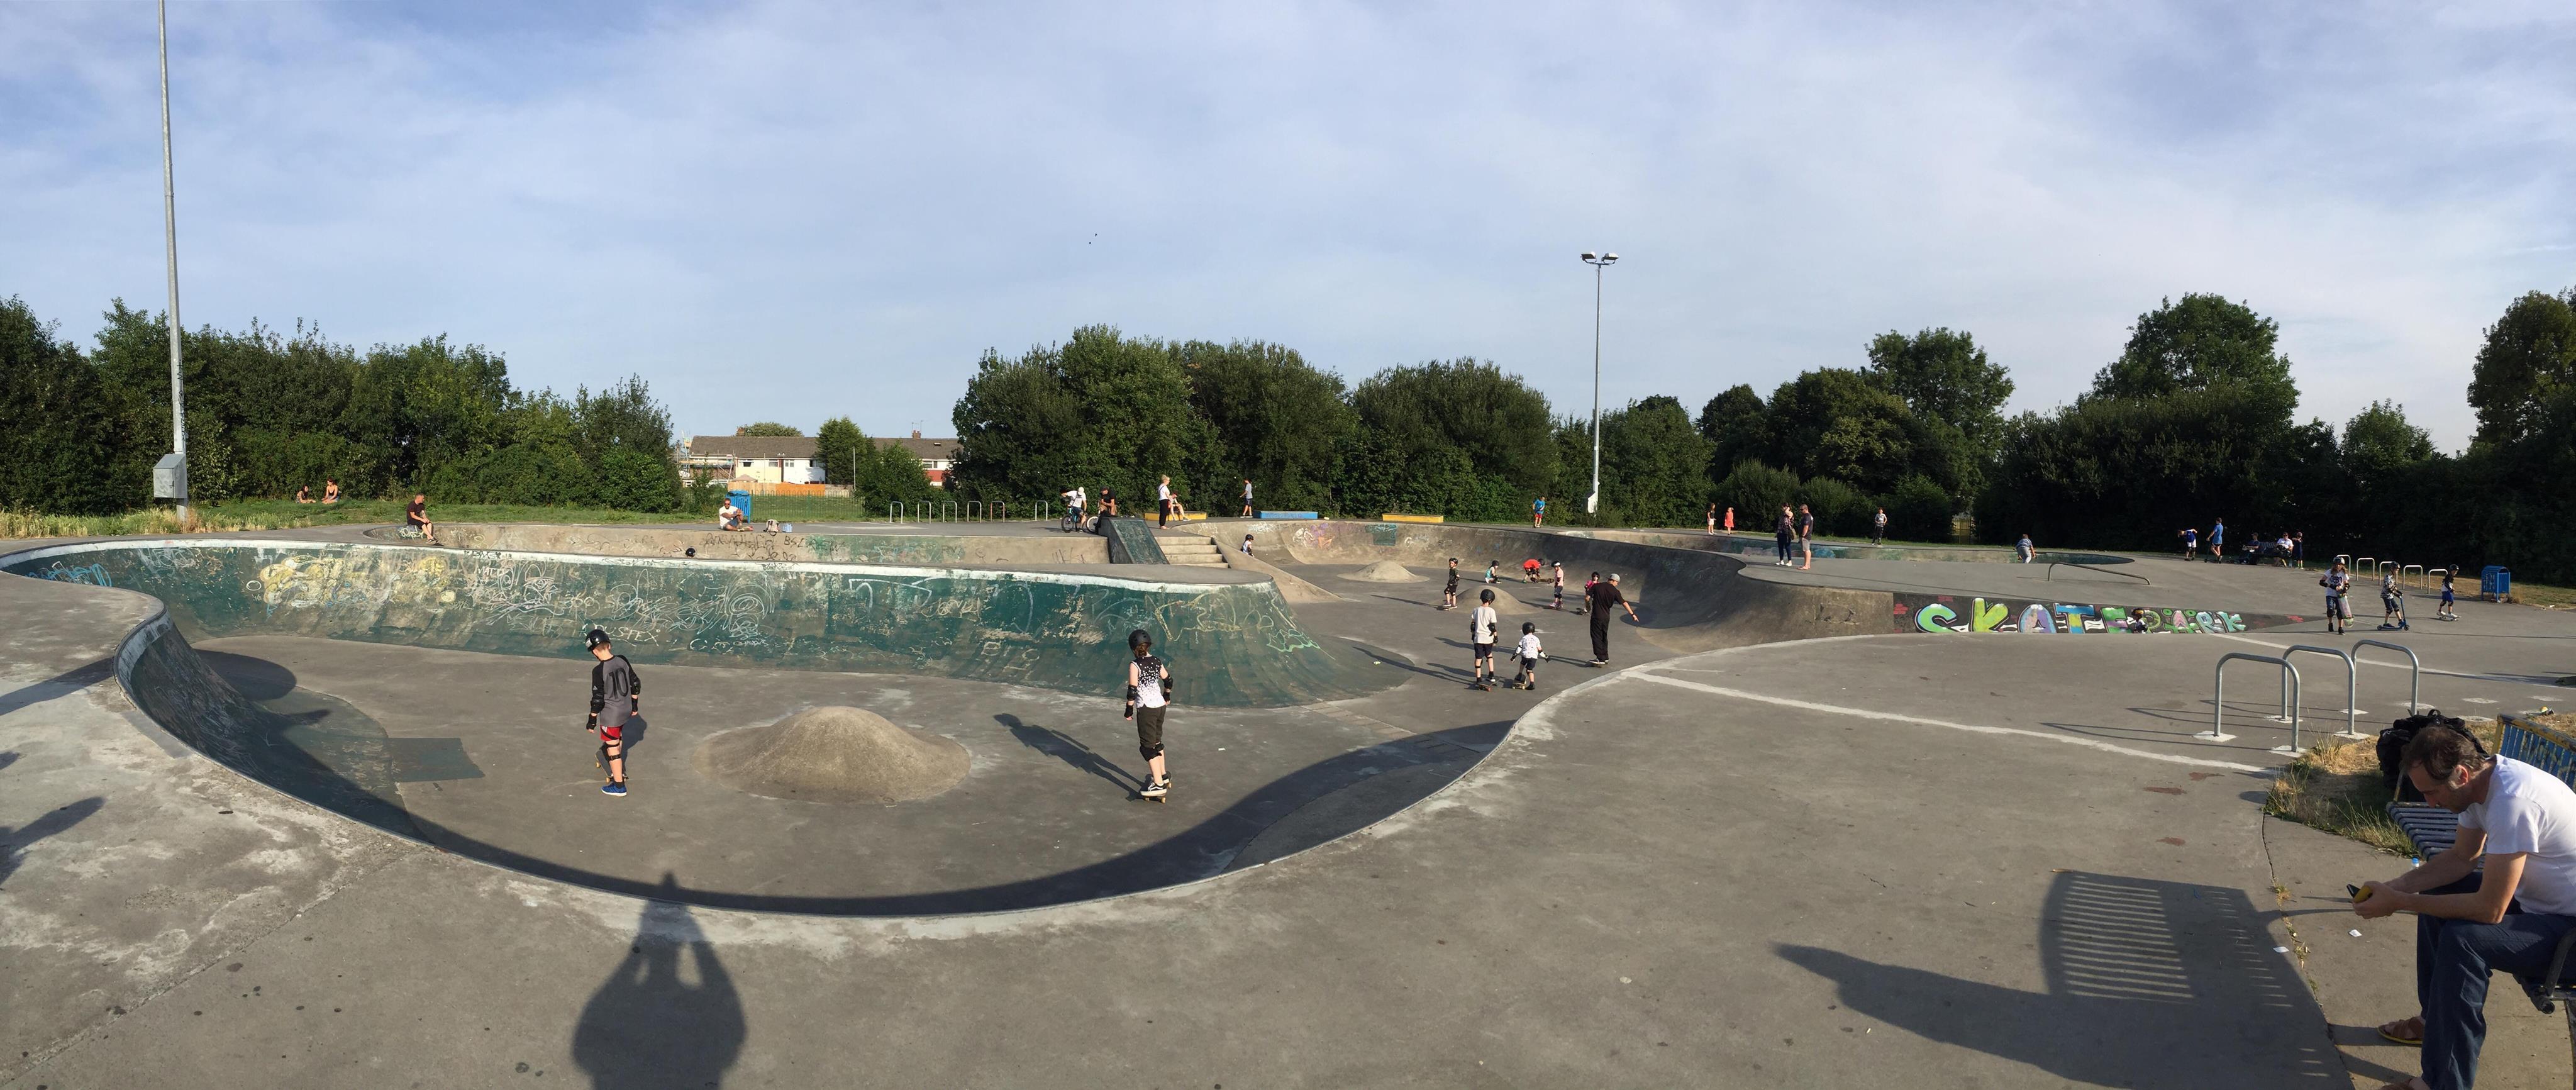 Ings Skate Park